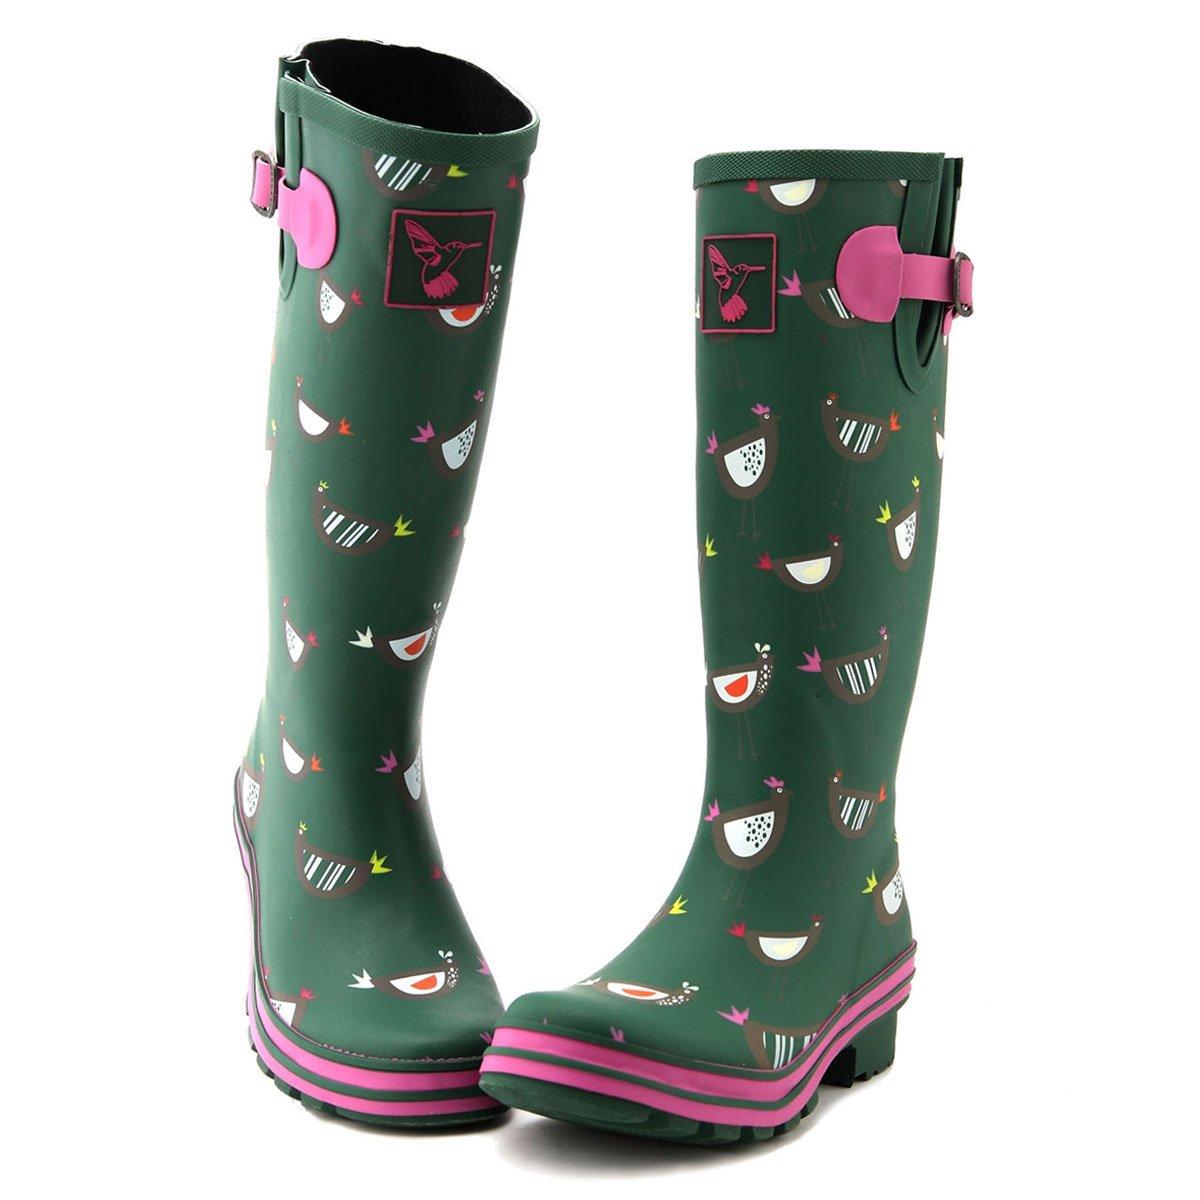 Evercreatures Brand Women's Rain Boots UK Brand Evercreatures Original Tall Rain Boot Gumboots Wellies B07CZMS26R 10 B(M) US / UK8 / EU41|Green 54d291